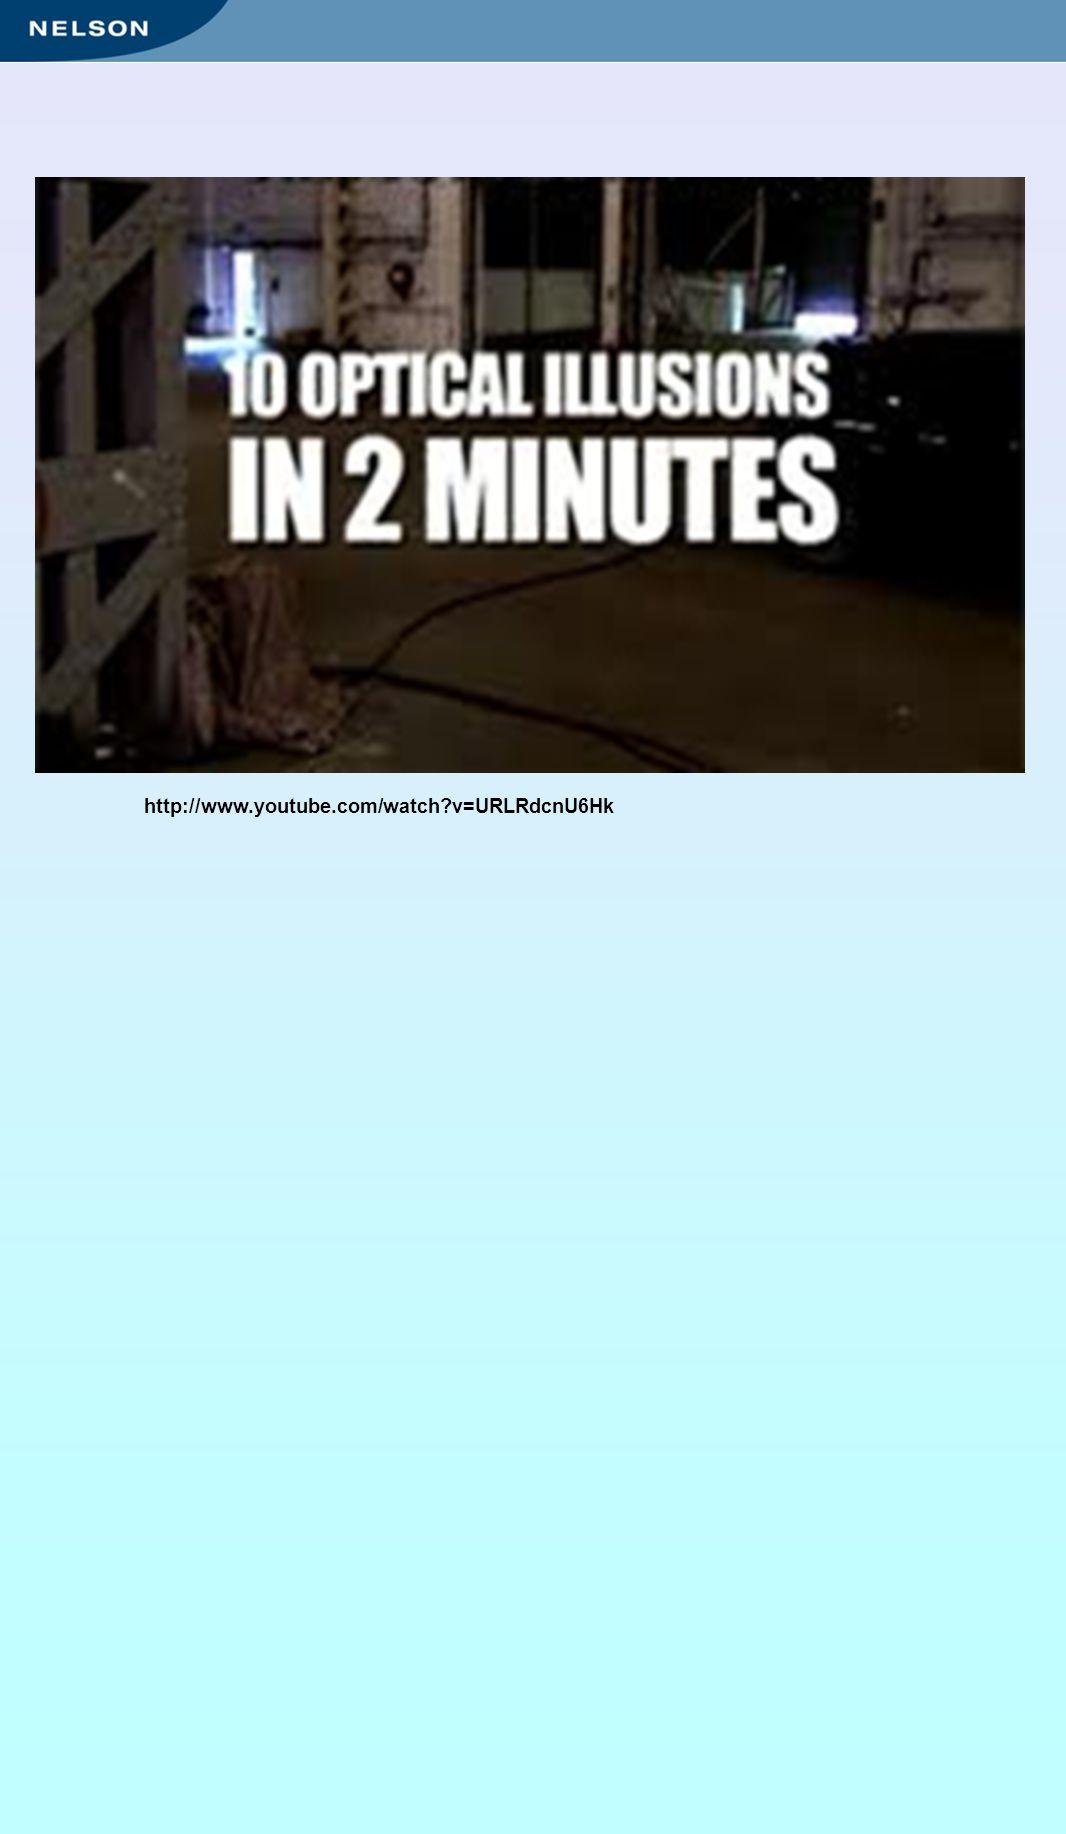 http://www.youtube.com/watch?v=URLRdcnU6Hk